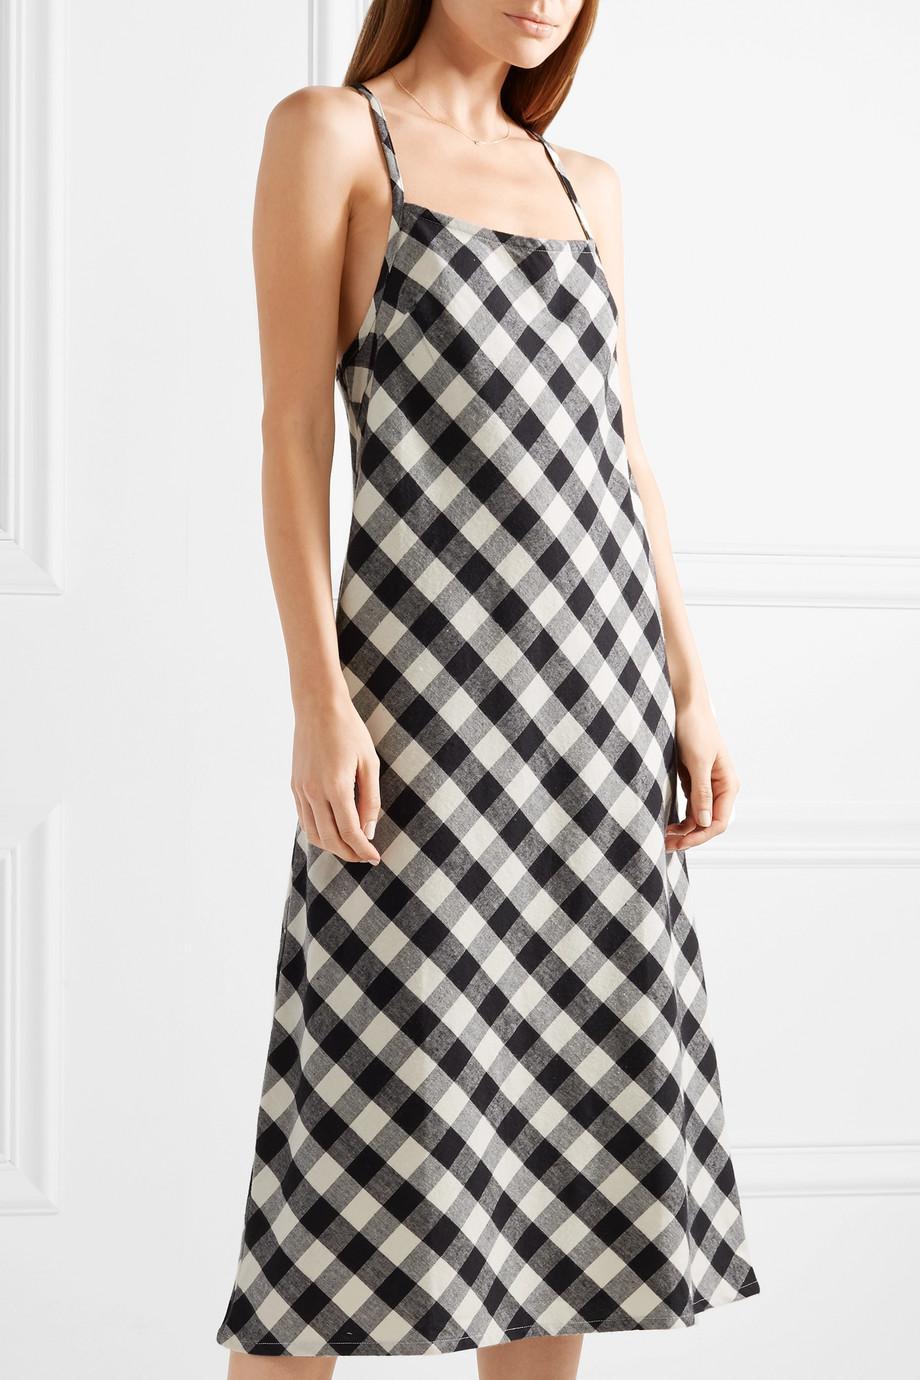 Leonie Gingham Cotton-flannel Nightdress - Black Skin Clearance Brand New Unisex Wnolu